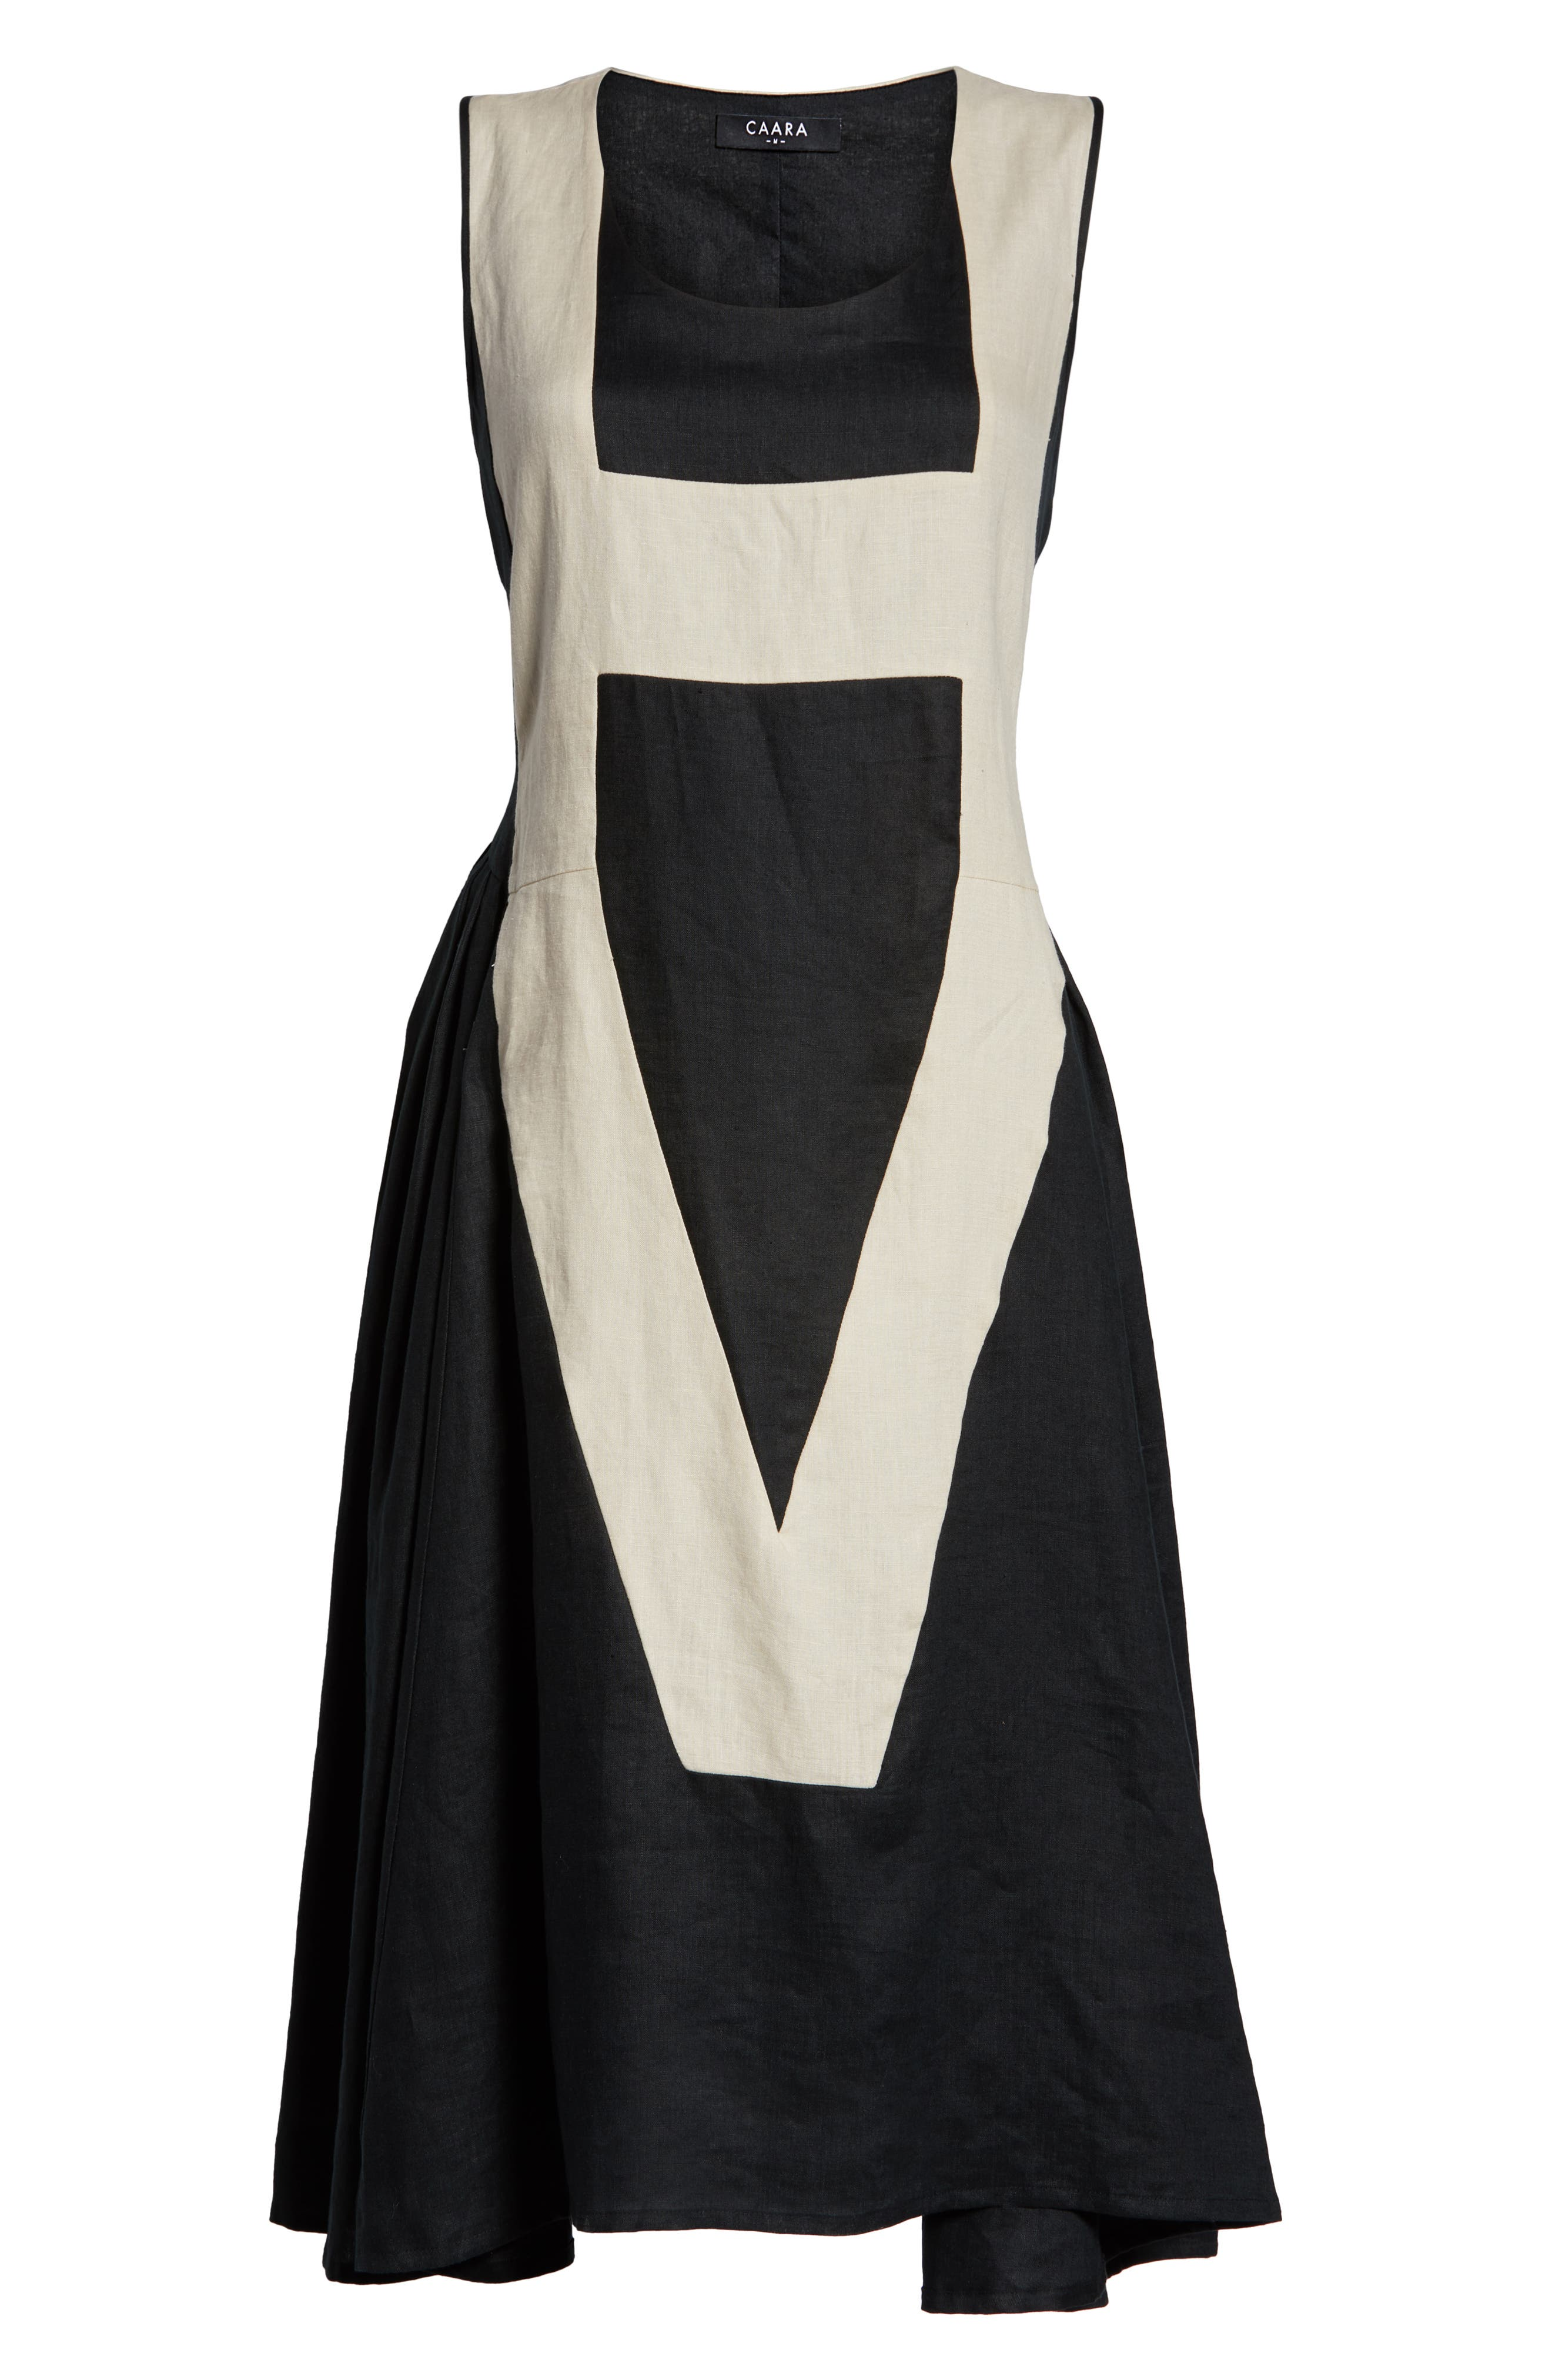 CAARA, Betha Colorblock Tie Back Dress, Alternate thumbnail 7, color, 001